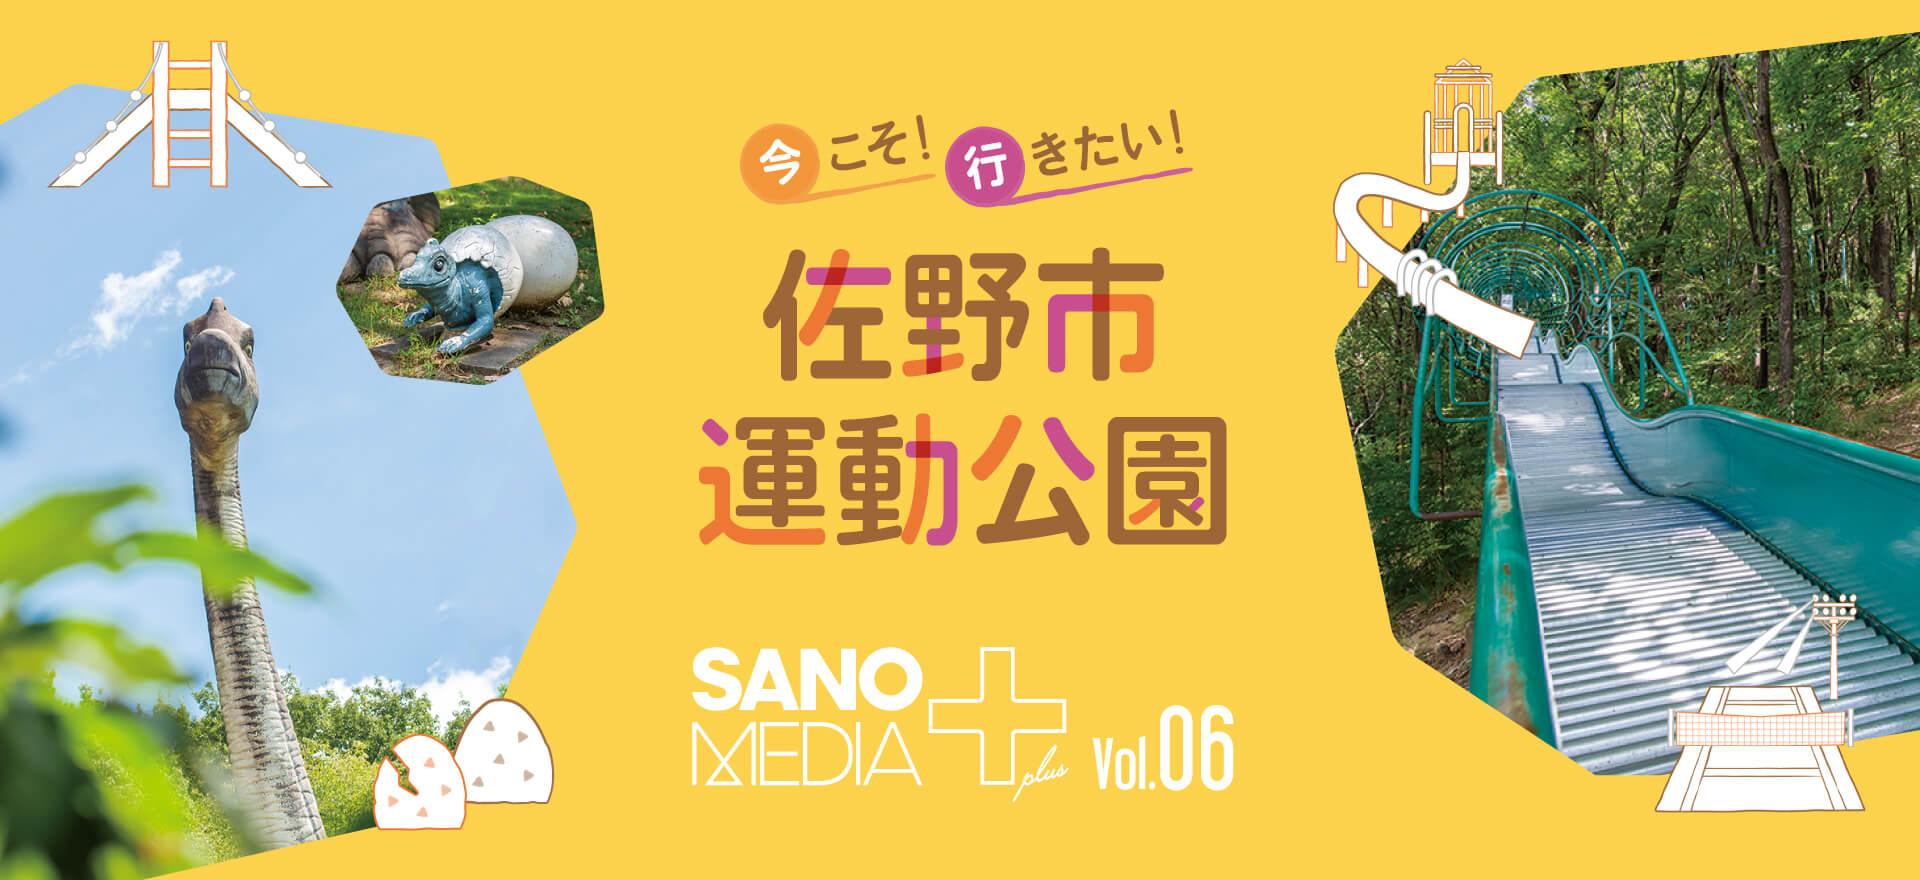 SANOMEDIA Plus Vol.06 「今こそ!行きたい!佐野市運動公園」